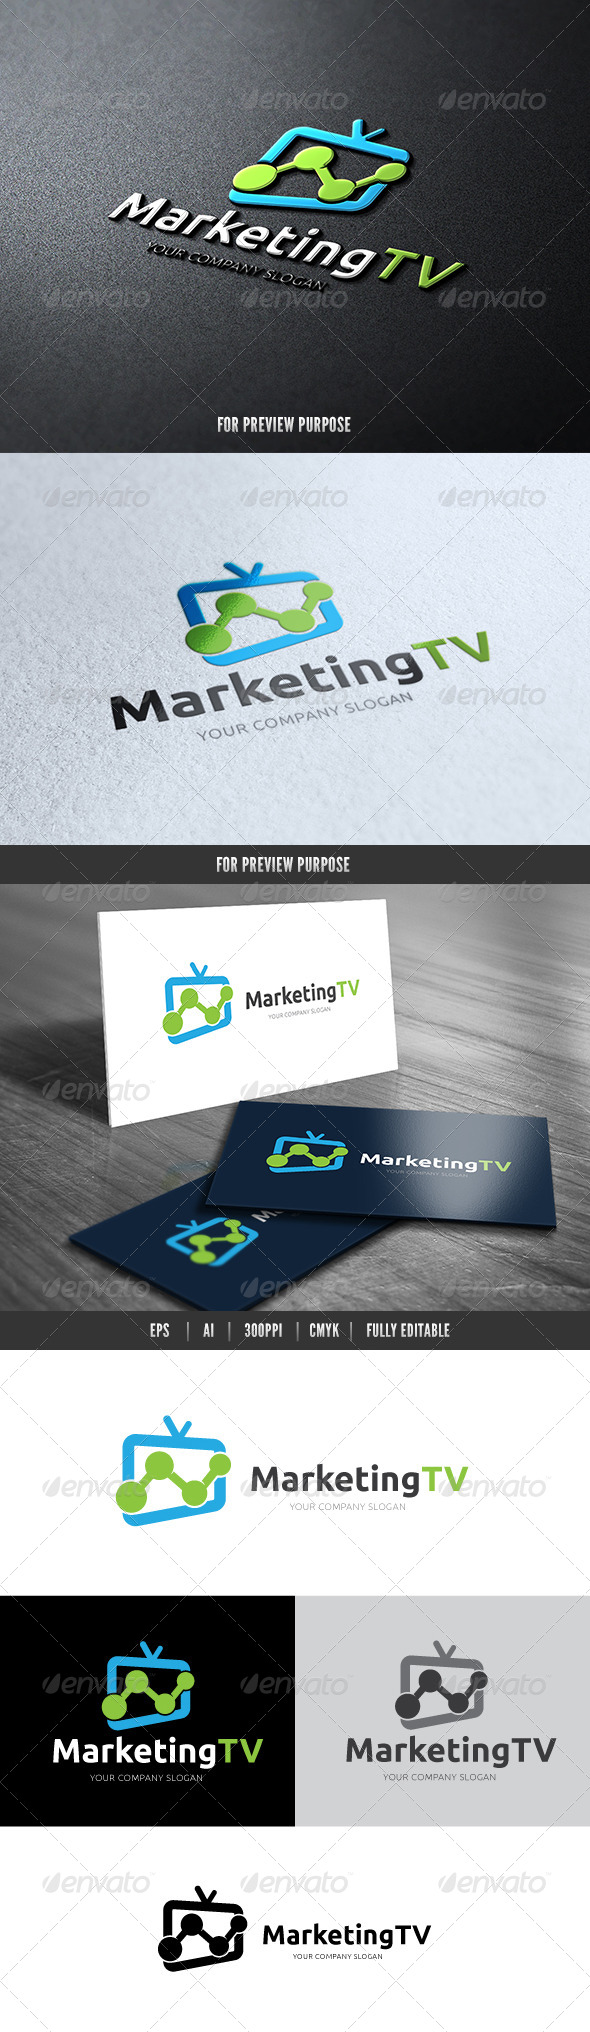 Marketing TV